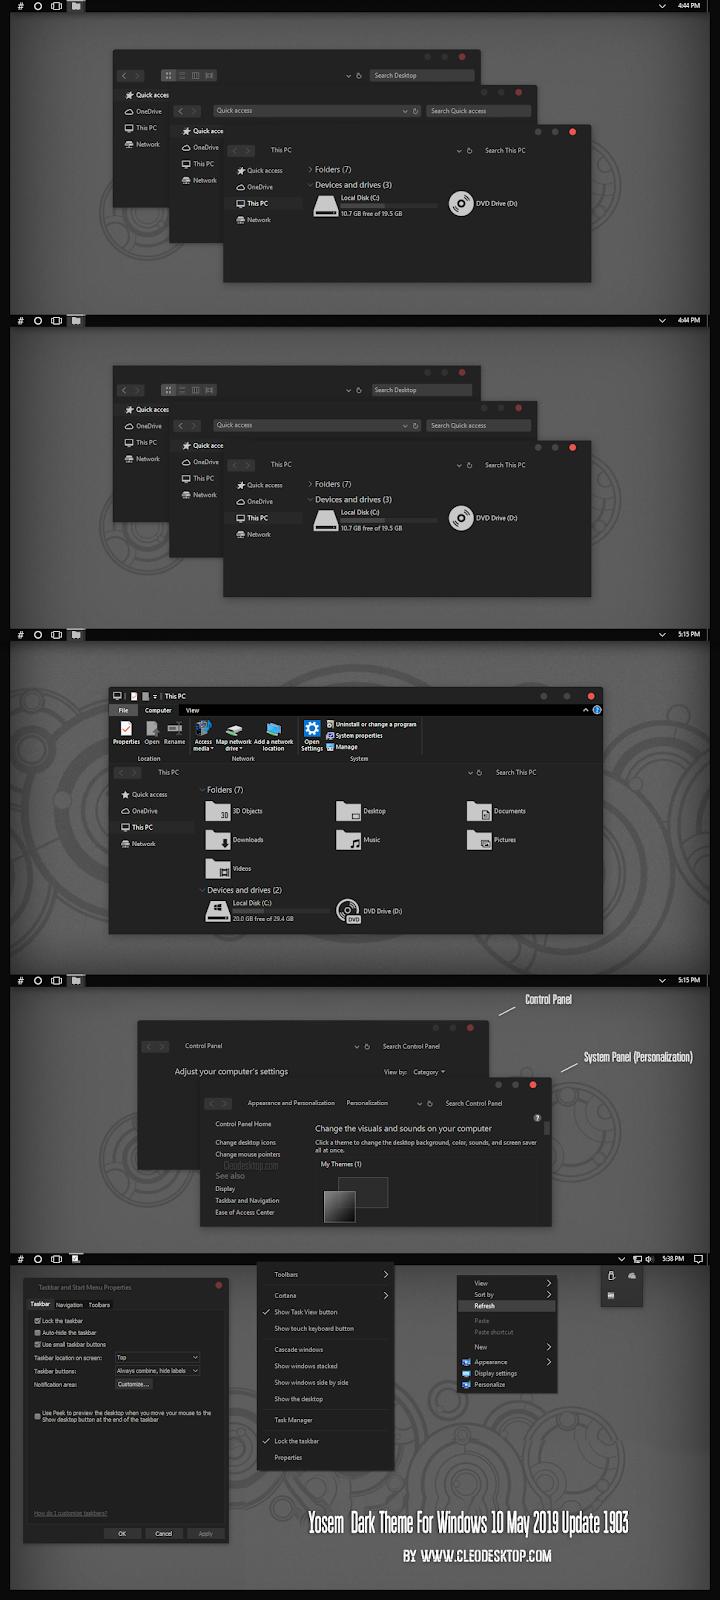 Yosem Dark Theme For Windows10 May 2019 Update 1903 - Cleodesktop I